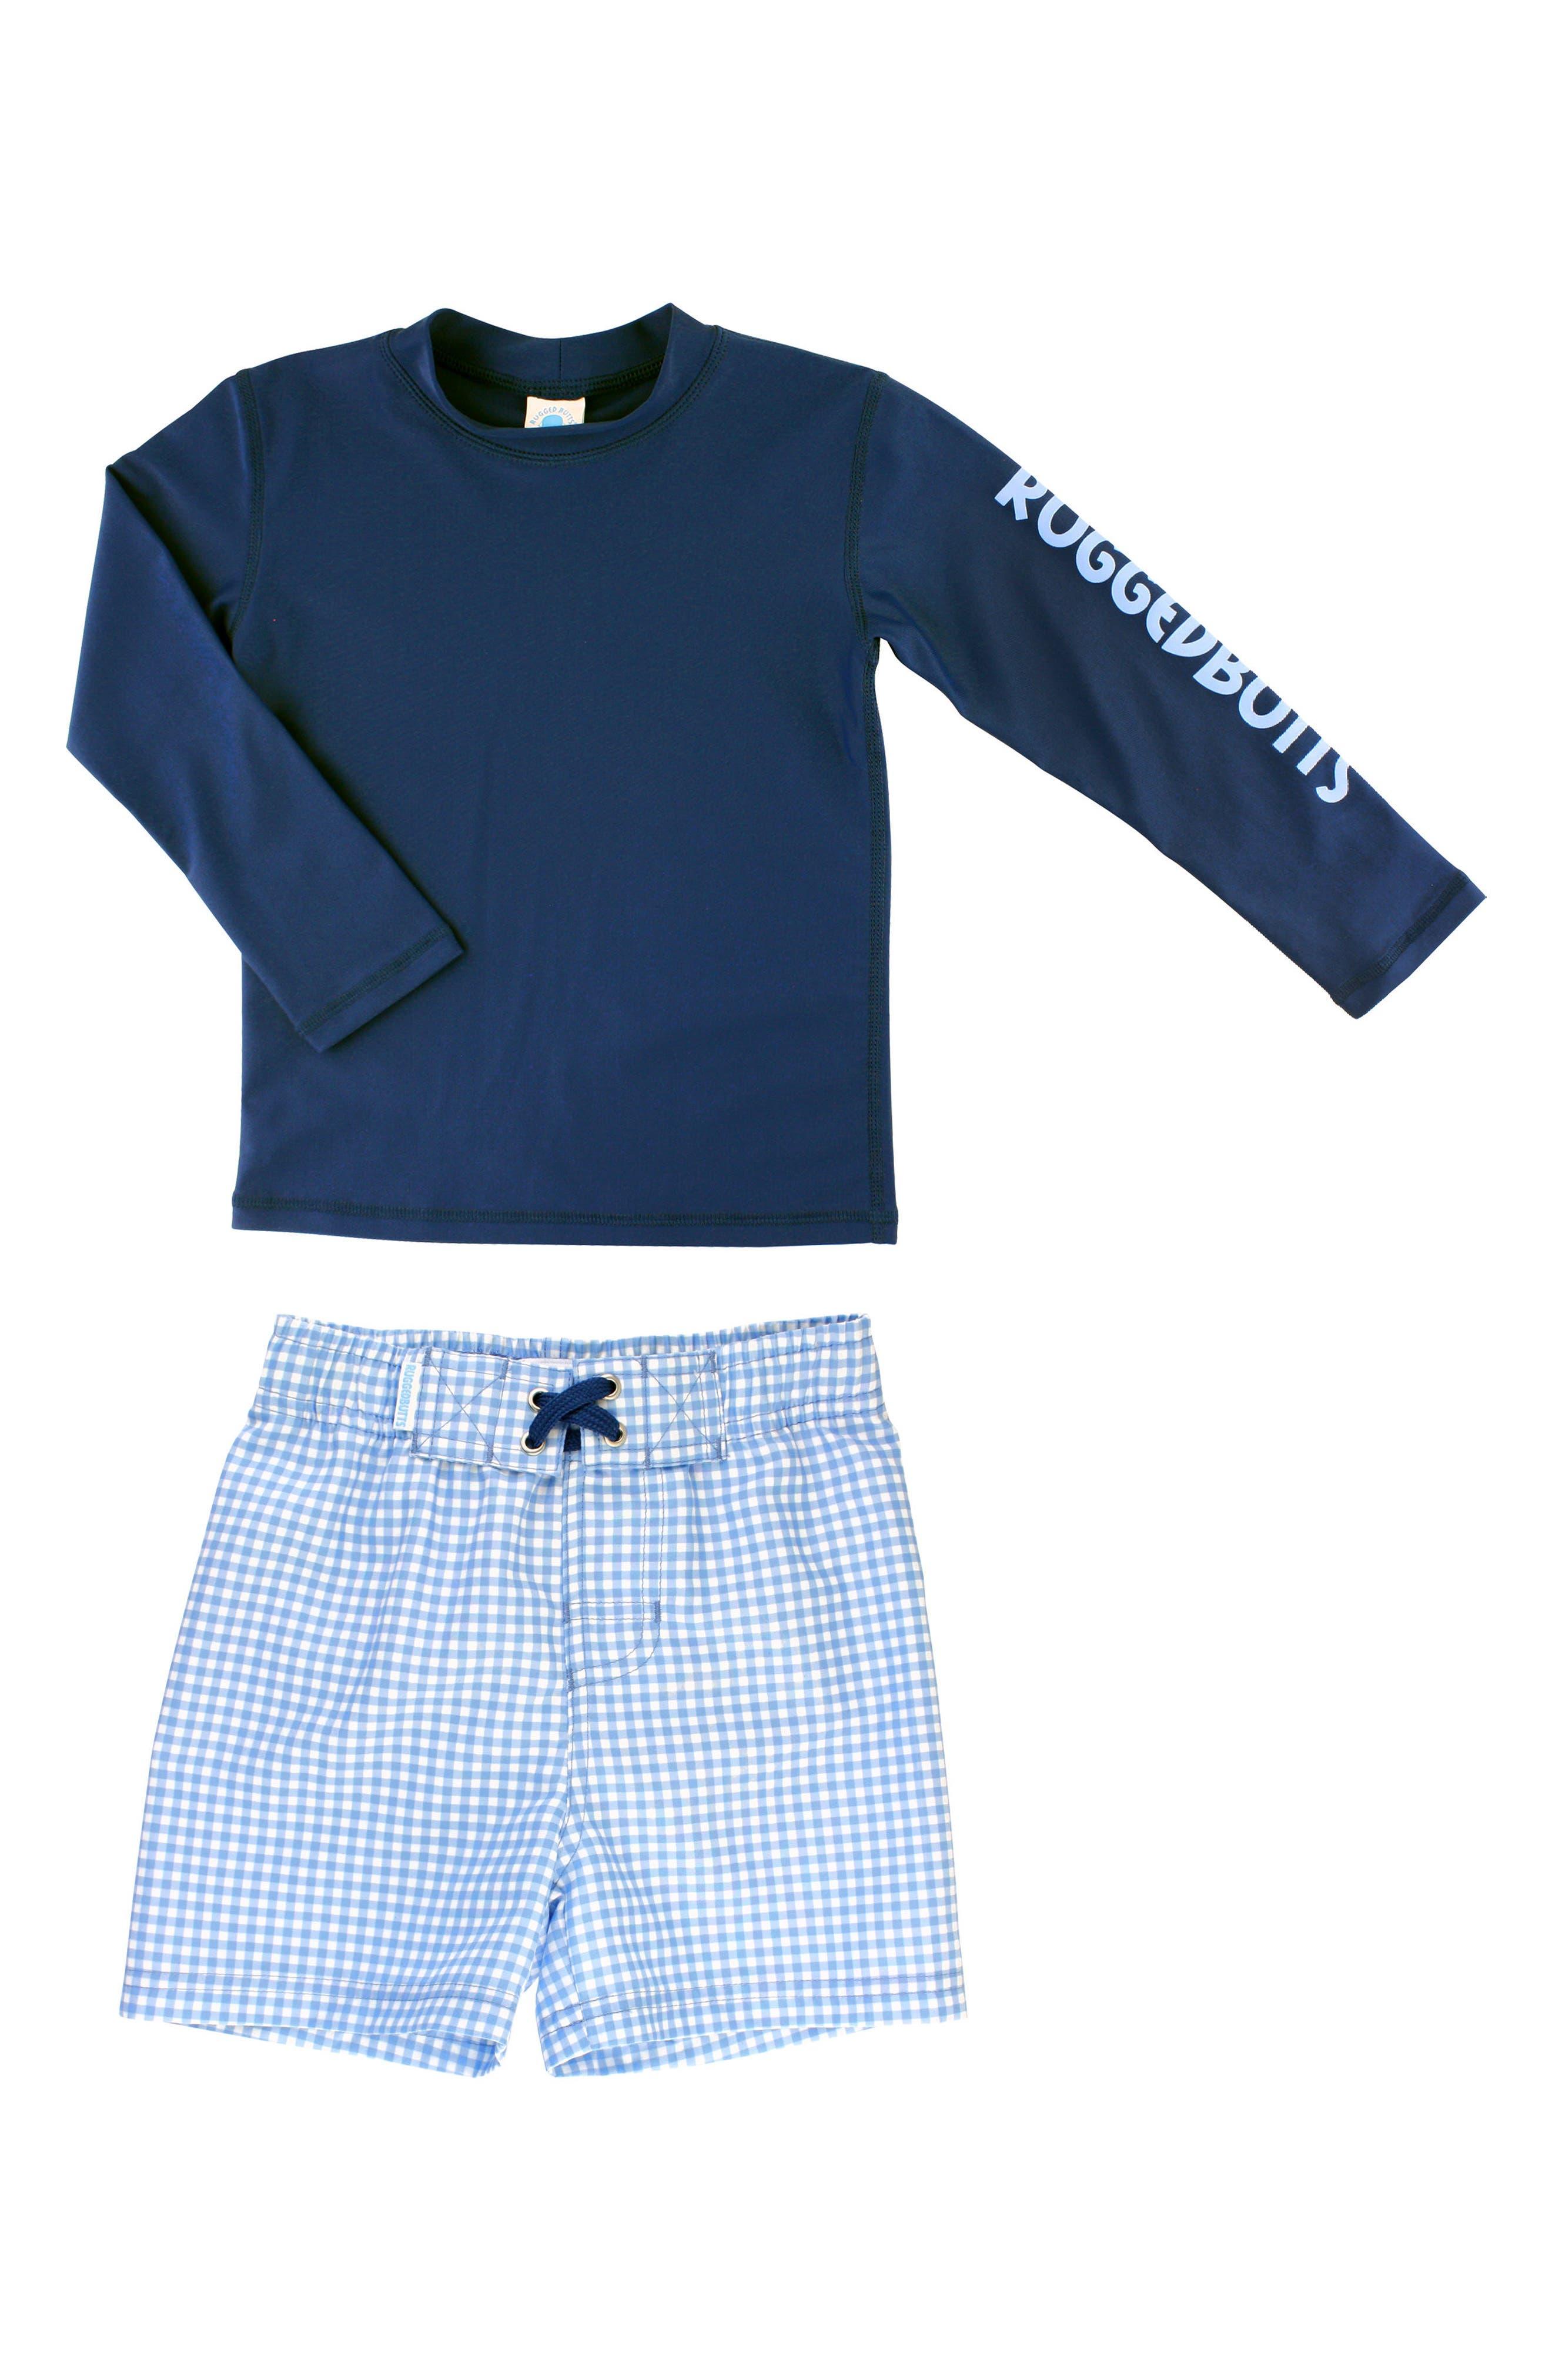 Alternate Image 3  - RuggedButts Long Sleeve Rashguard & Gingham Board Shorts Set (Toddler Boys & Little Boys)